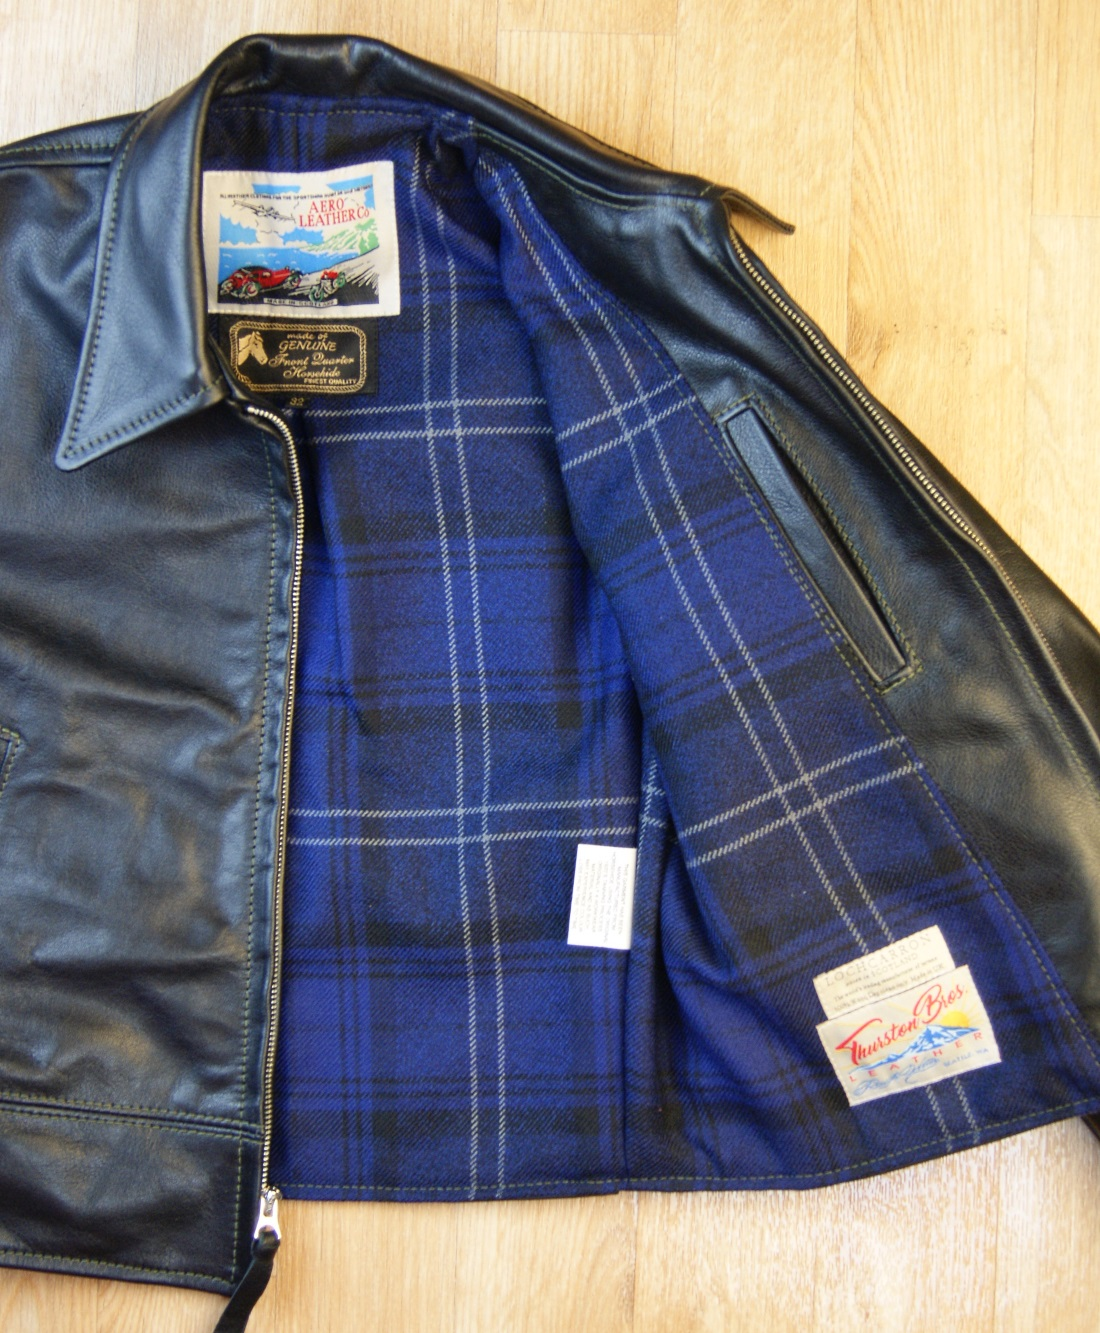 Aero Premier Half Belt Dustbowl Black VicenzaNavy Highland Granite heavy tartan smaller.jpg